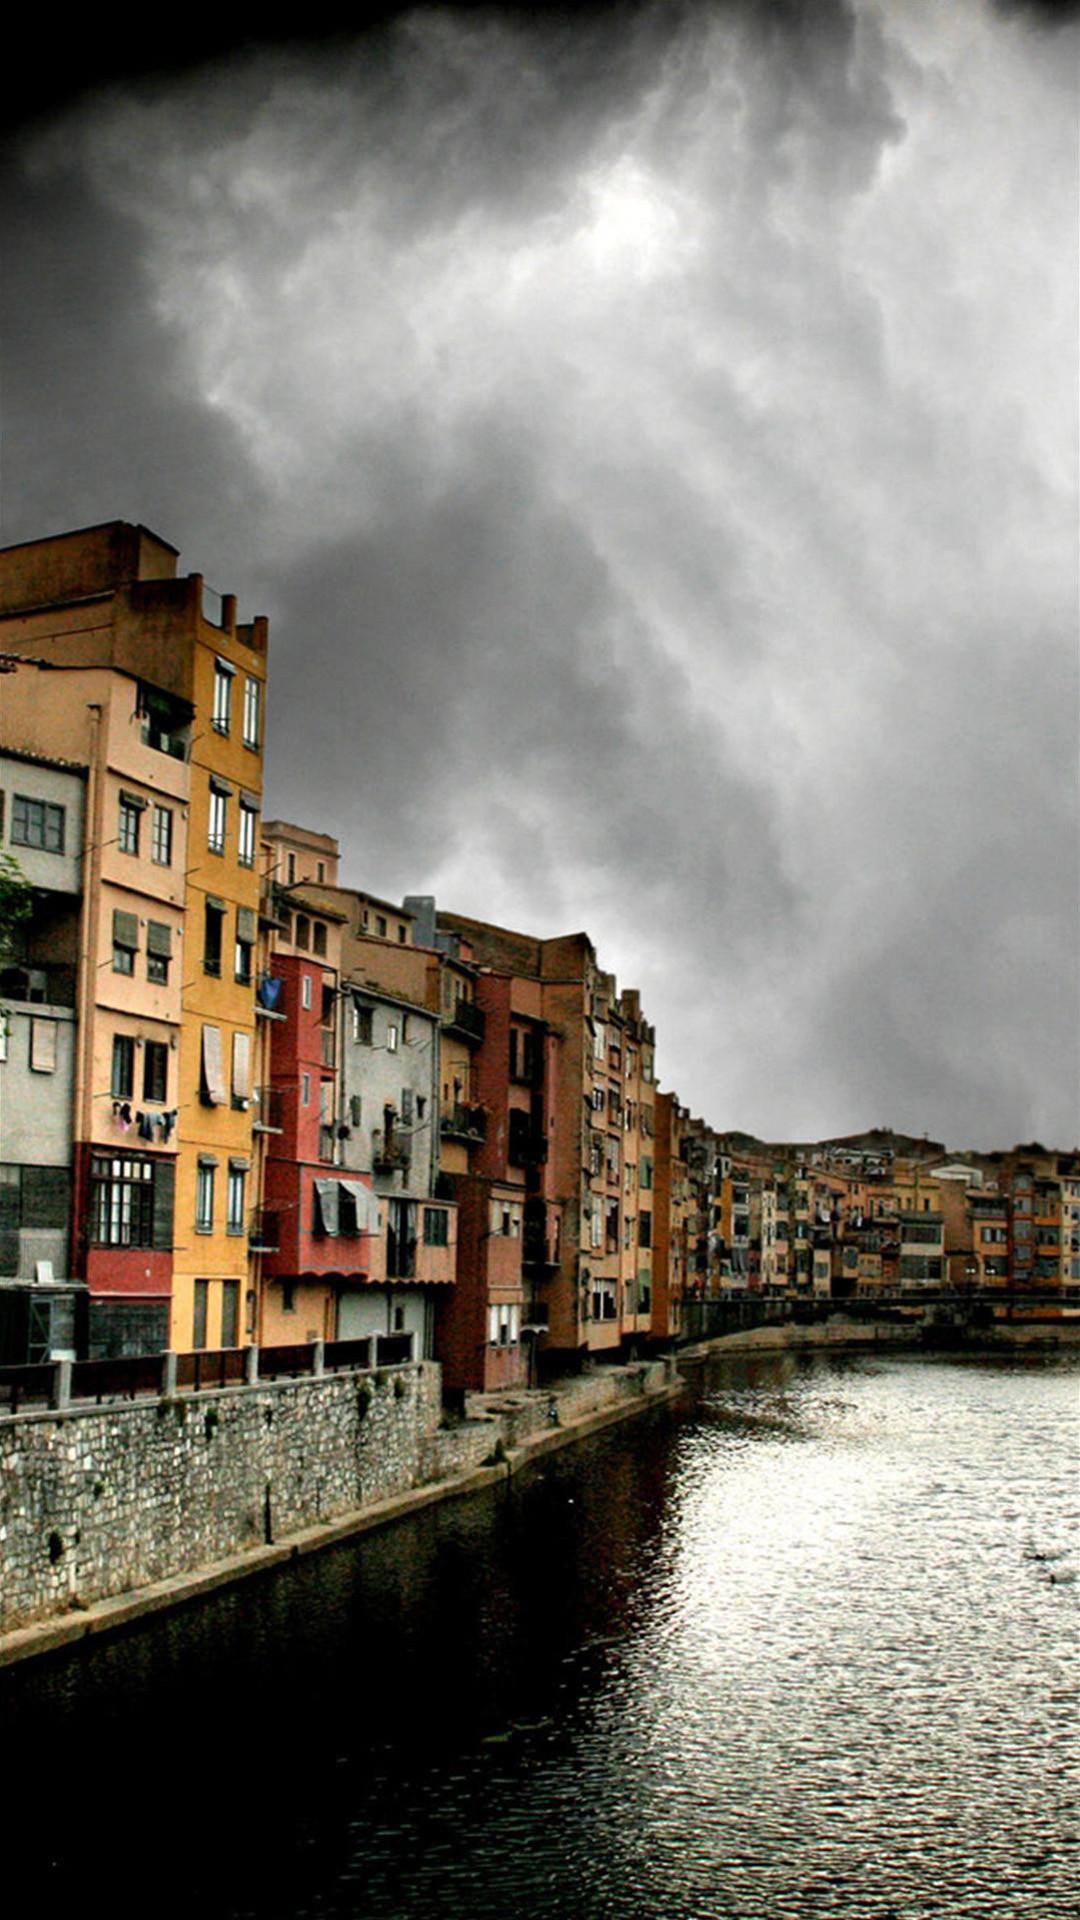 Spain Girona Jewish Neighborhood iPhone 7 Plus HD Wallpaper